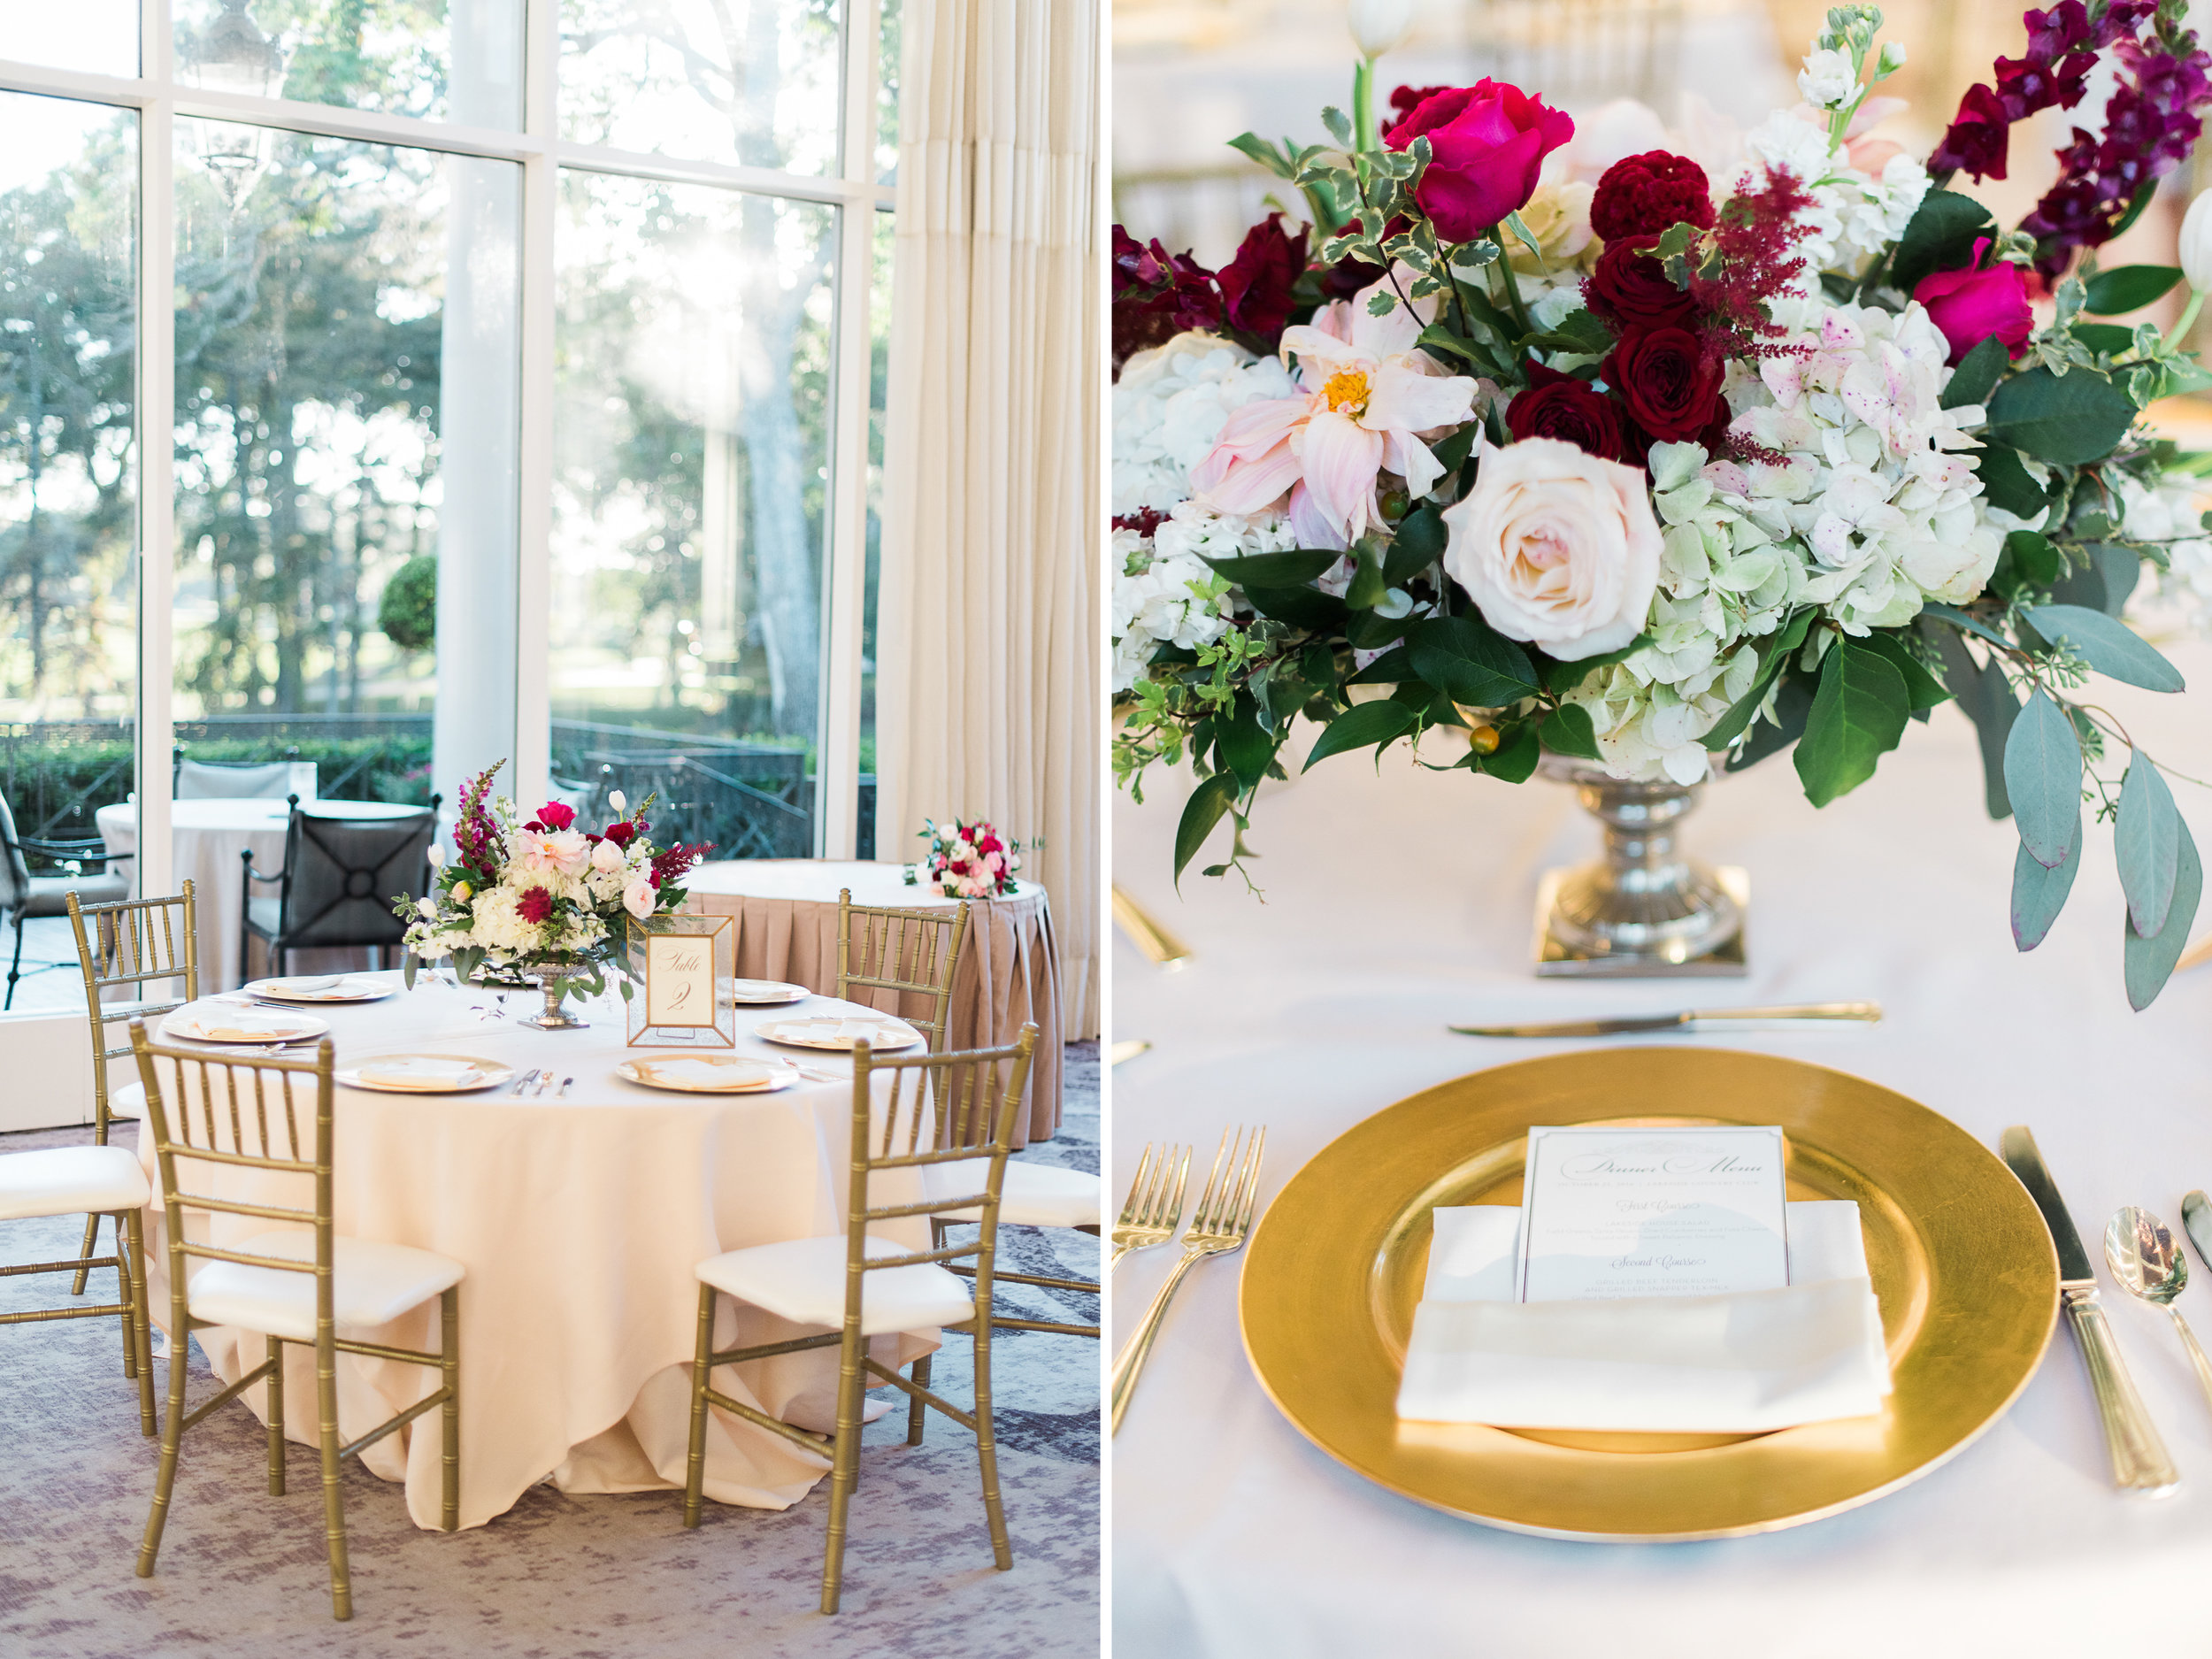 Houston-Wedding-Photographer-Lakeside-Country-Club-First-Look-Bride-Groom-Formals-Film-Fine-Art-Photography-120.jpg